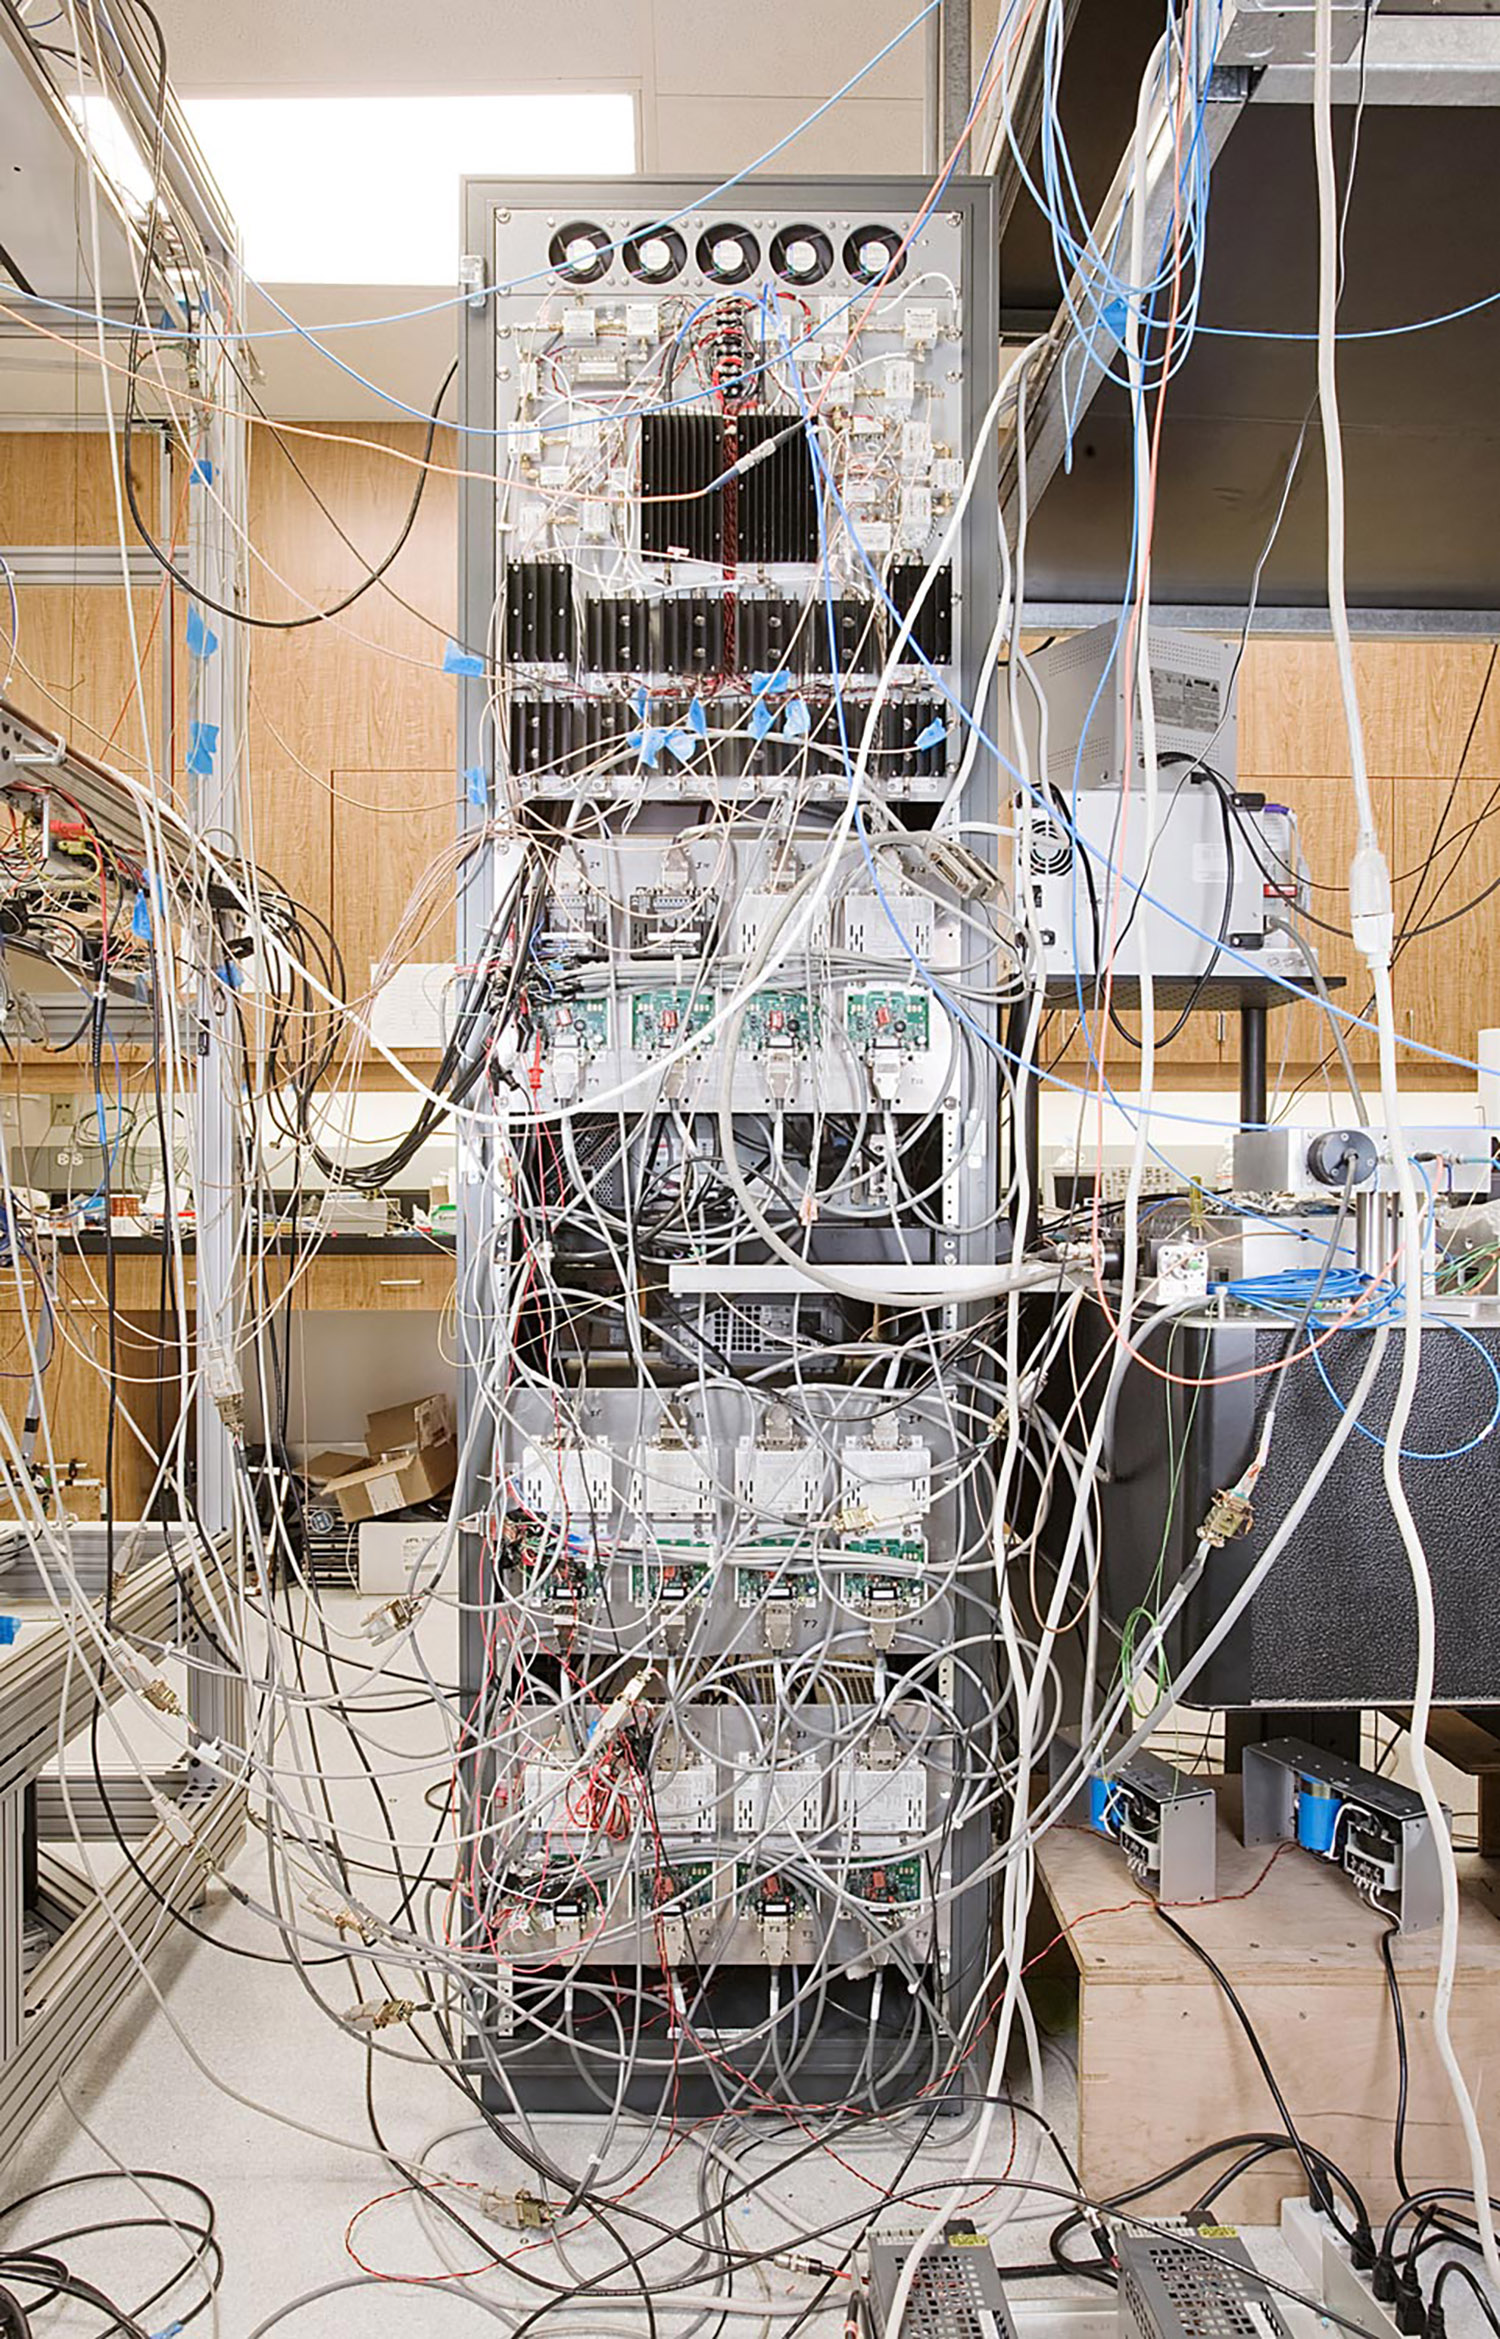 Quantum Lab, NASA/JPL, Pasadena, California, 2008